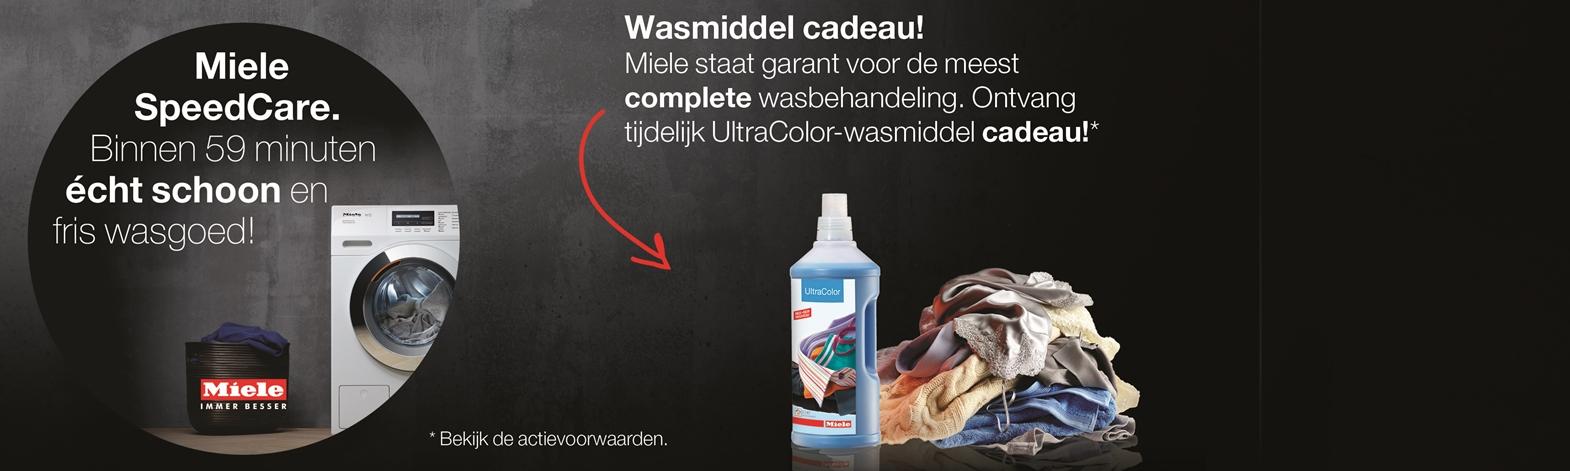 UltraColor-wasmiddel cadeau | Miele SpeedCare wasmachine | EP.nl